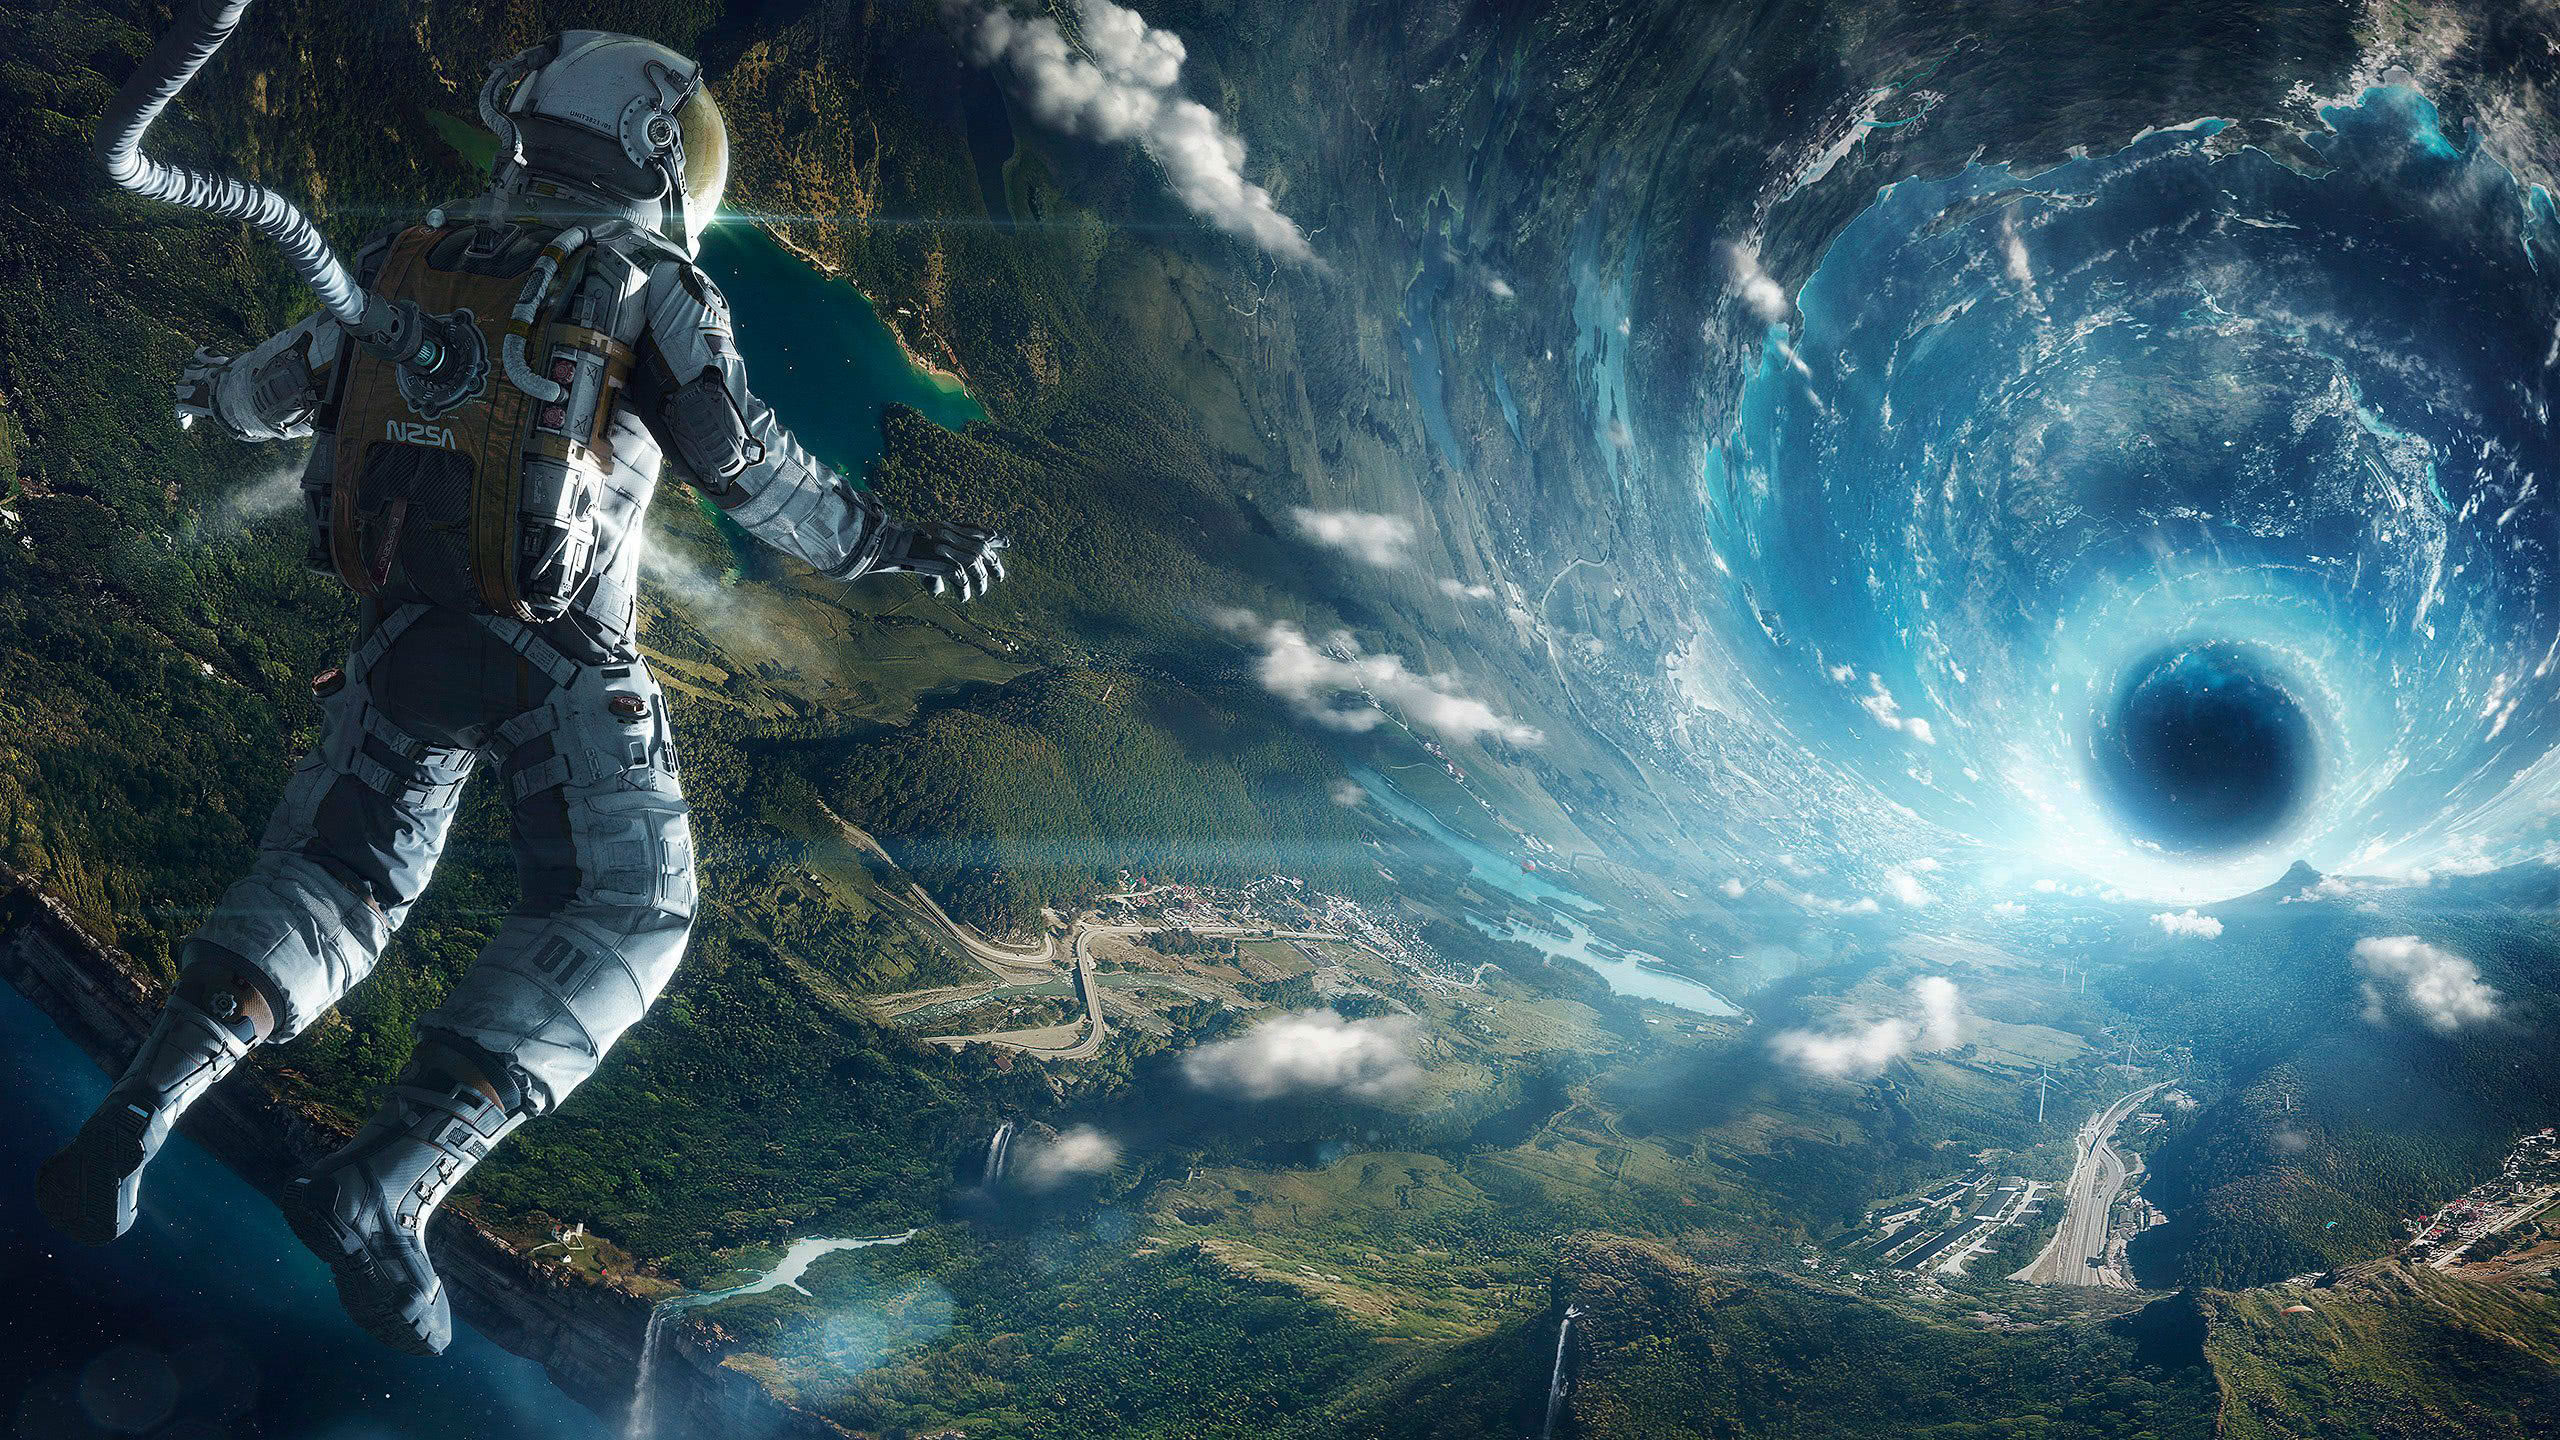 astronaut black hole wqhd 1440p wallpaper